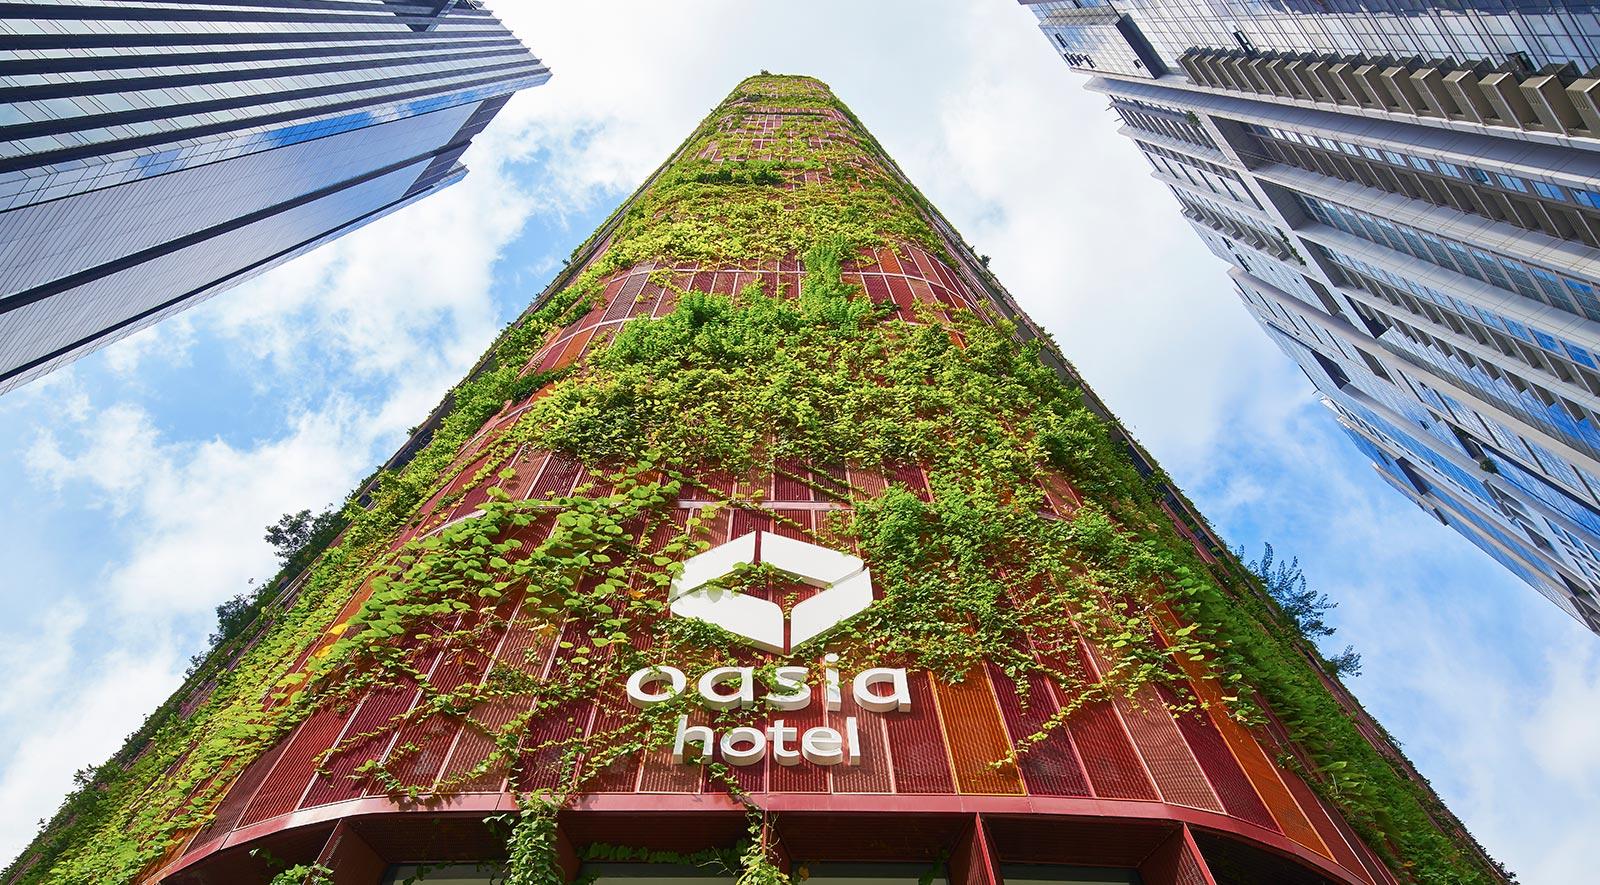 图源:豪亚酒店(Oasia Hotels)集团